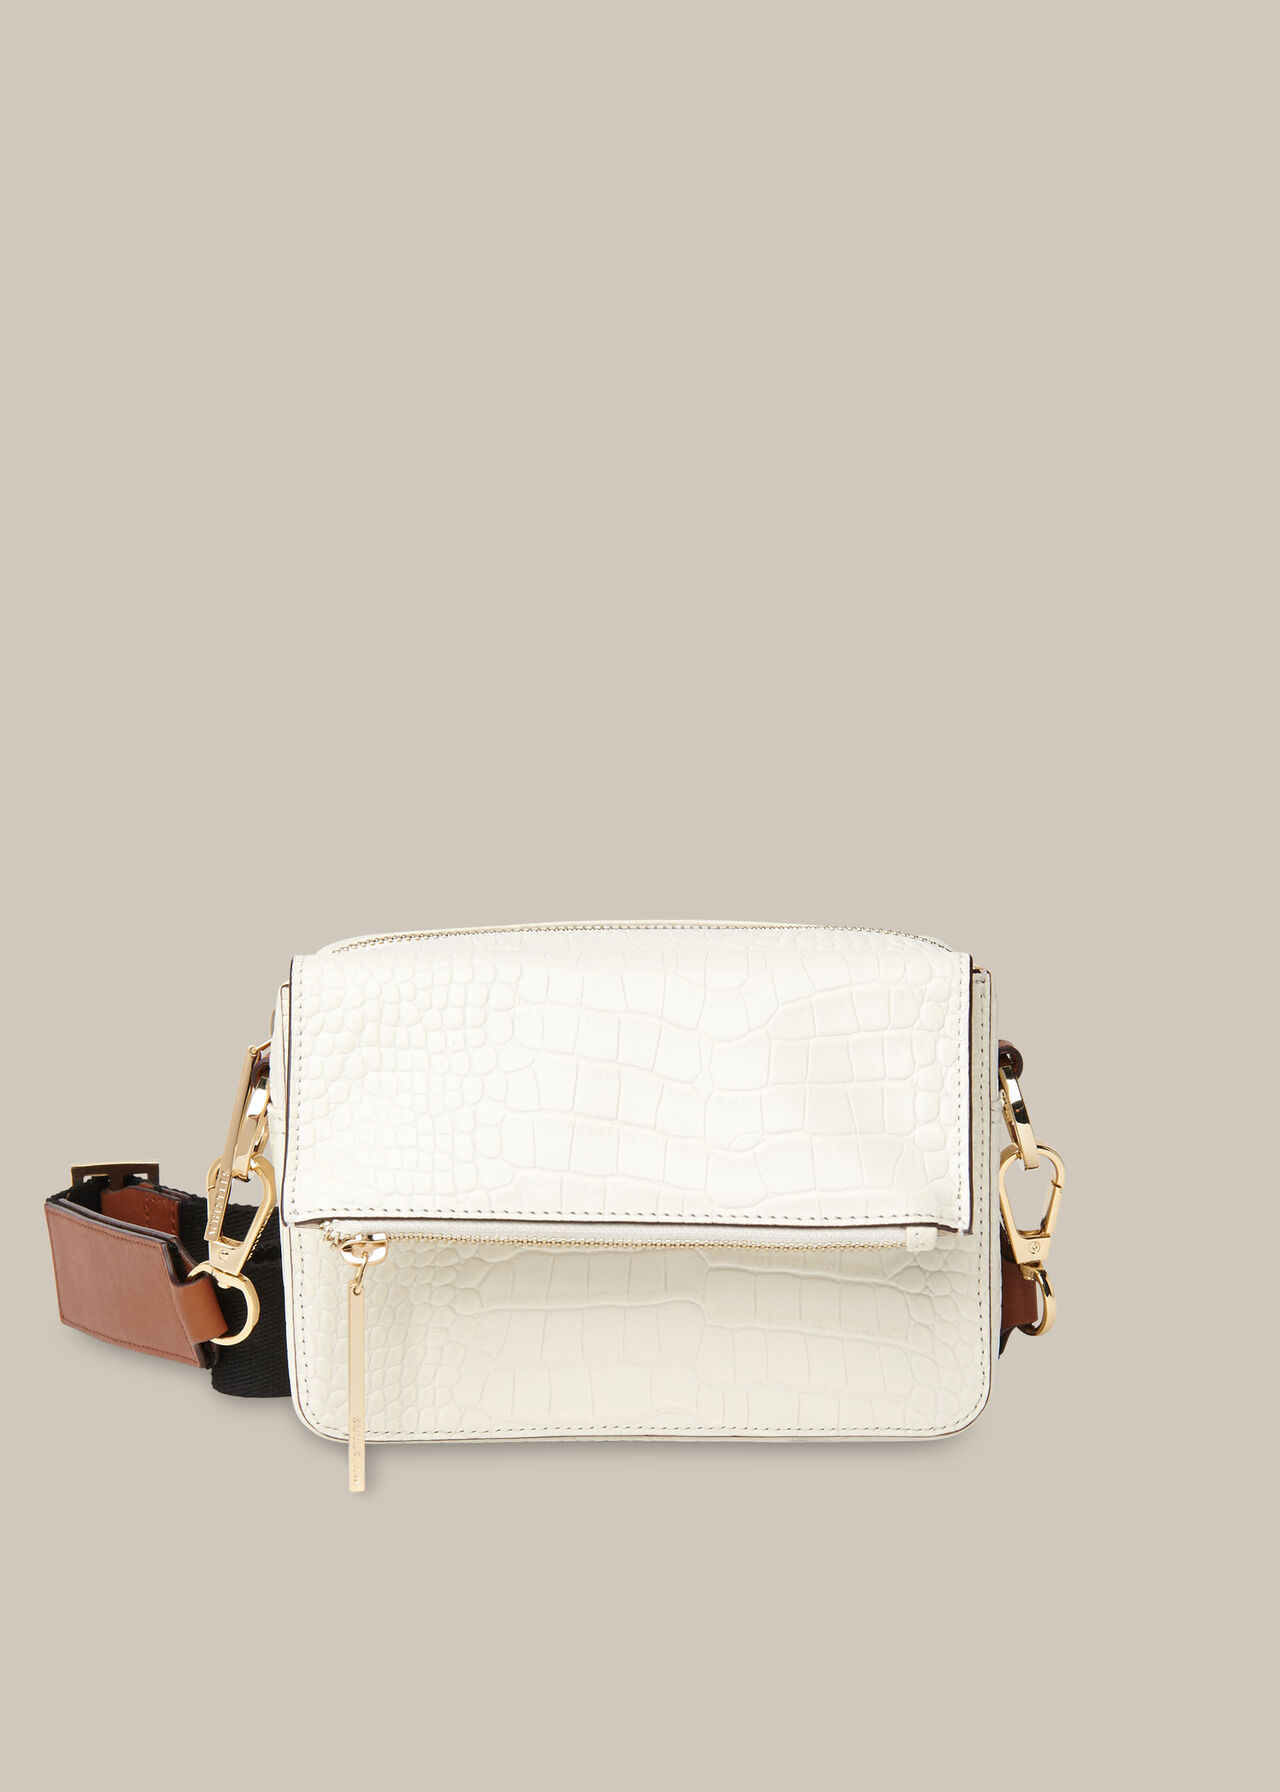 Millie Croc Crossbody Bag